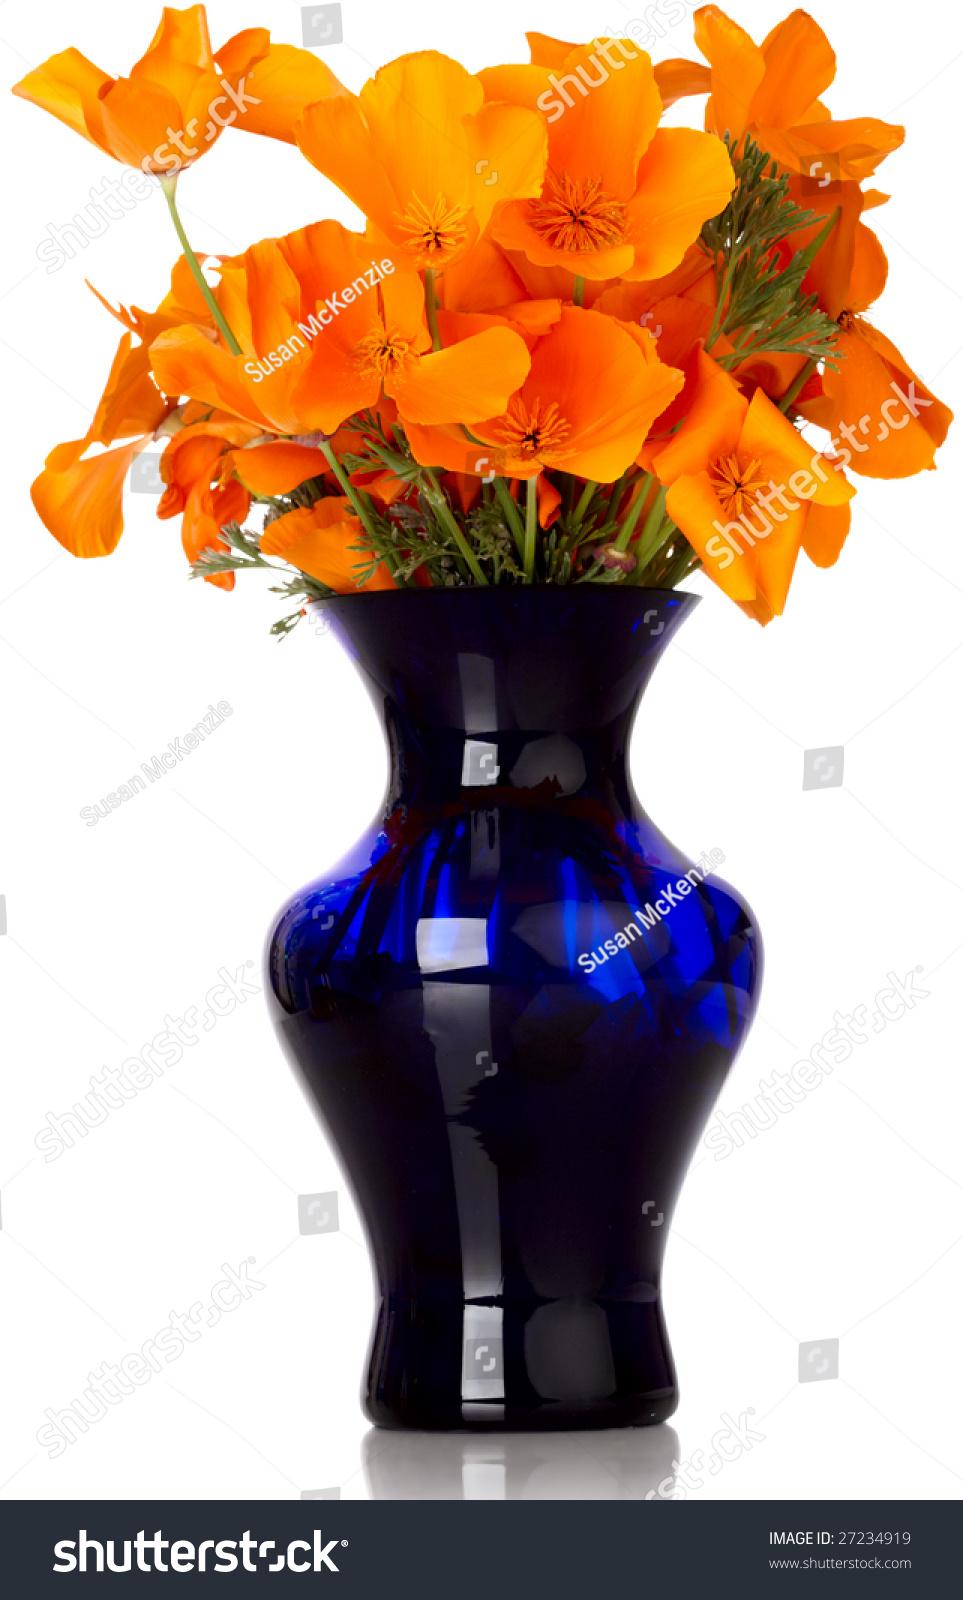 Flower Arrangement Orange California Poppys Blue Stock Photo 27234919 Shutterstock